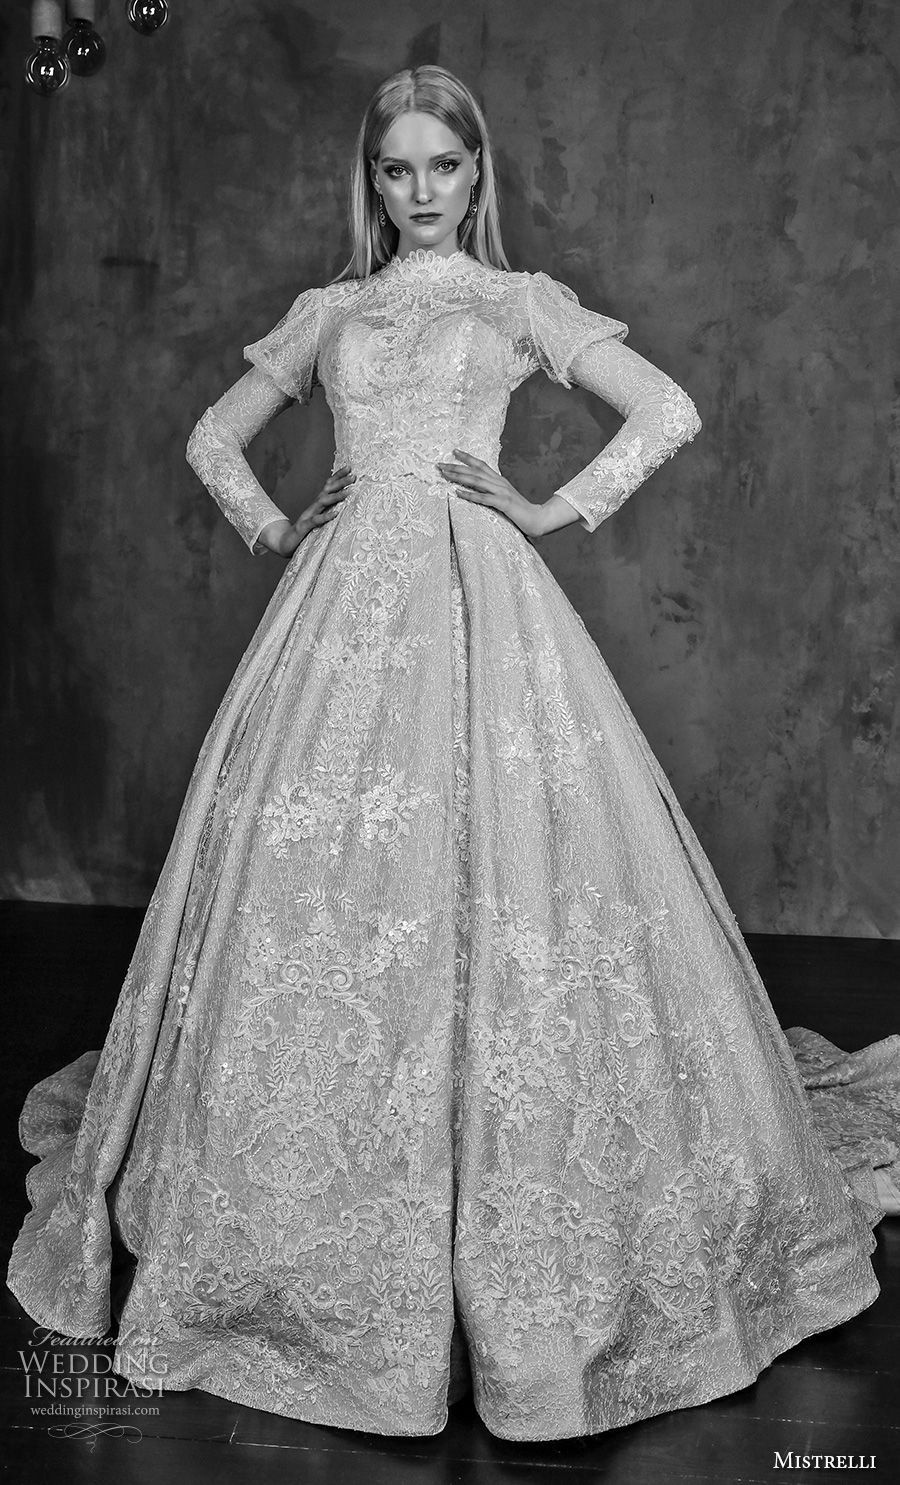 Long sleeve black wedding dresses  Mistrelli  Wedding Dresses u ucModern Renaissanceud Bridal